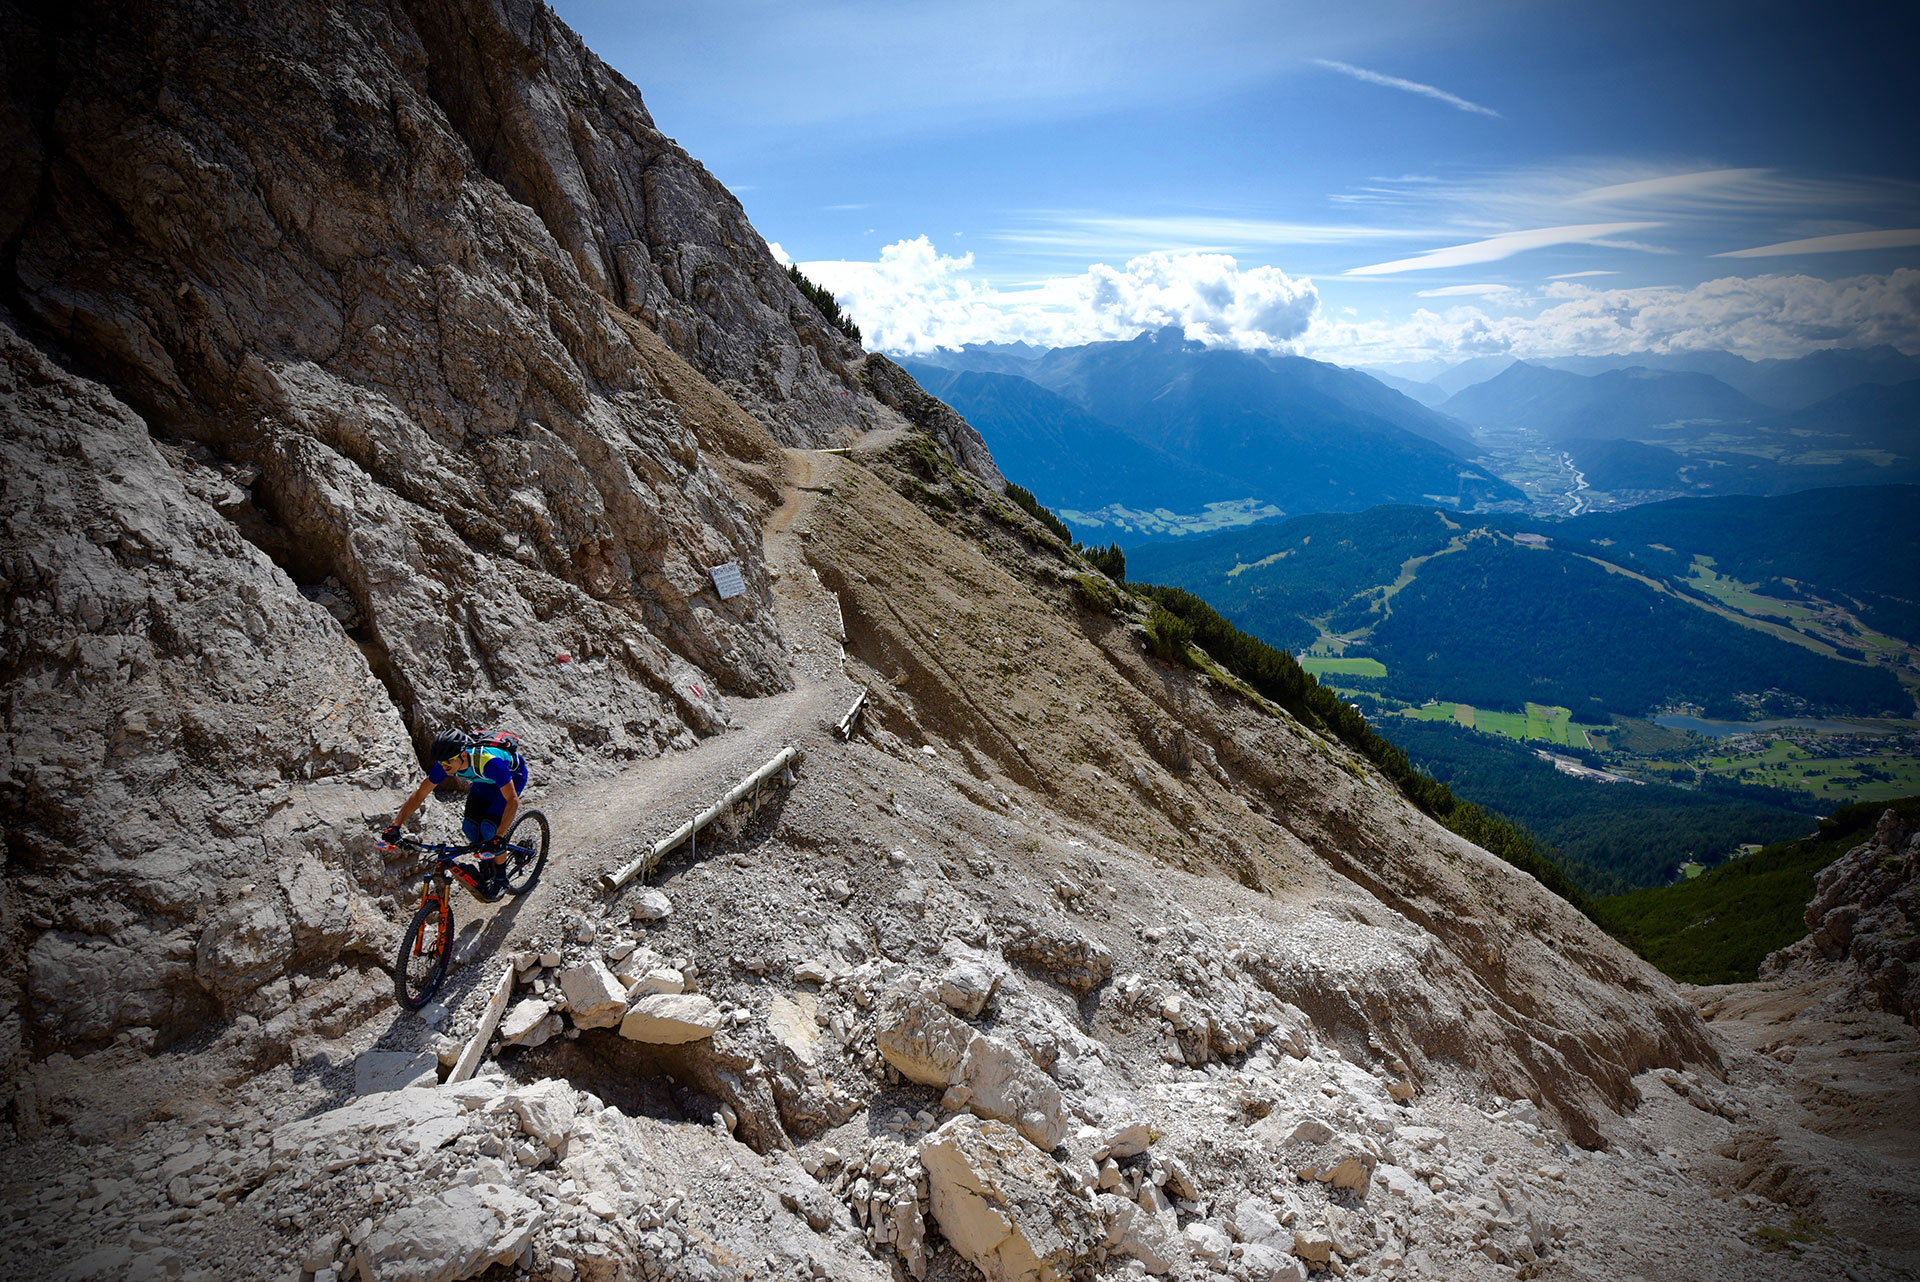 """All-Mountain"" prend ici tout son sens ! © Claus Wachsmann"